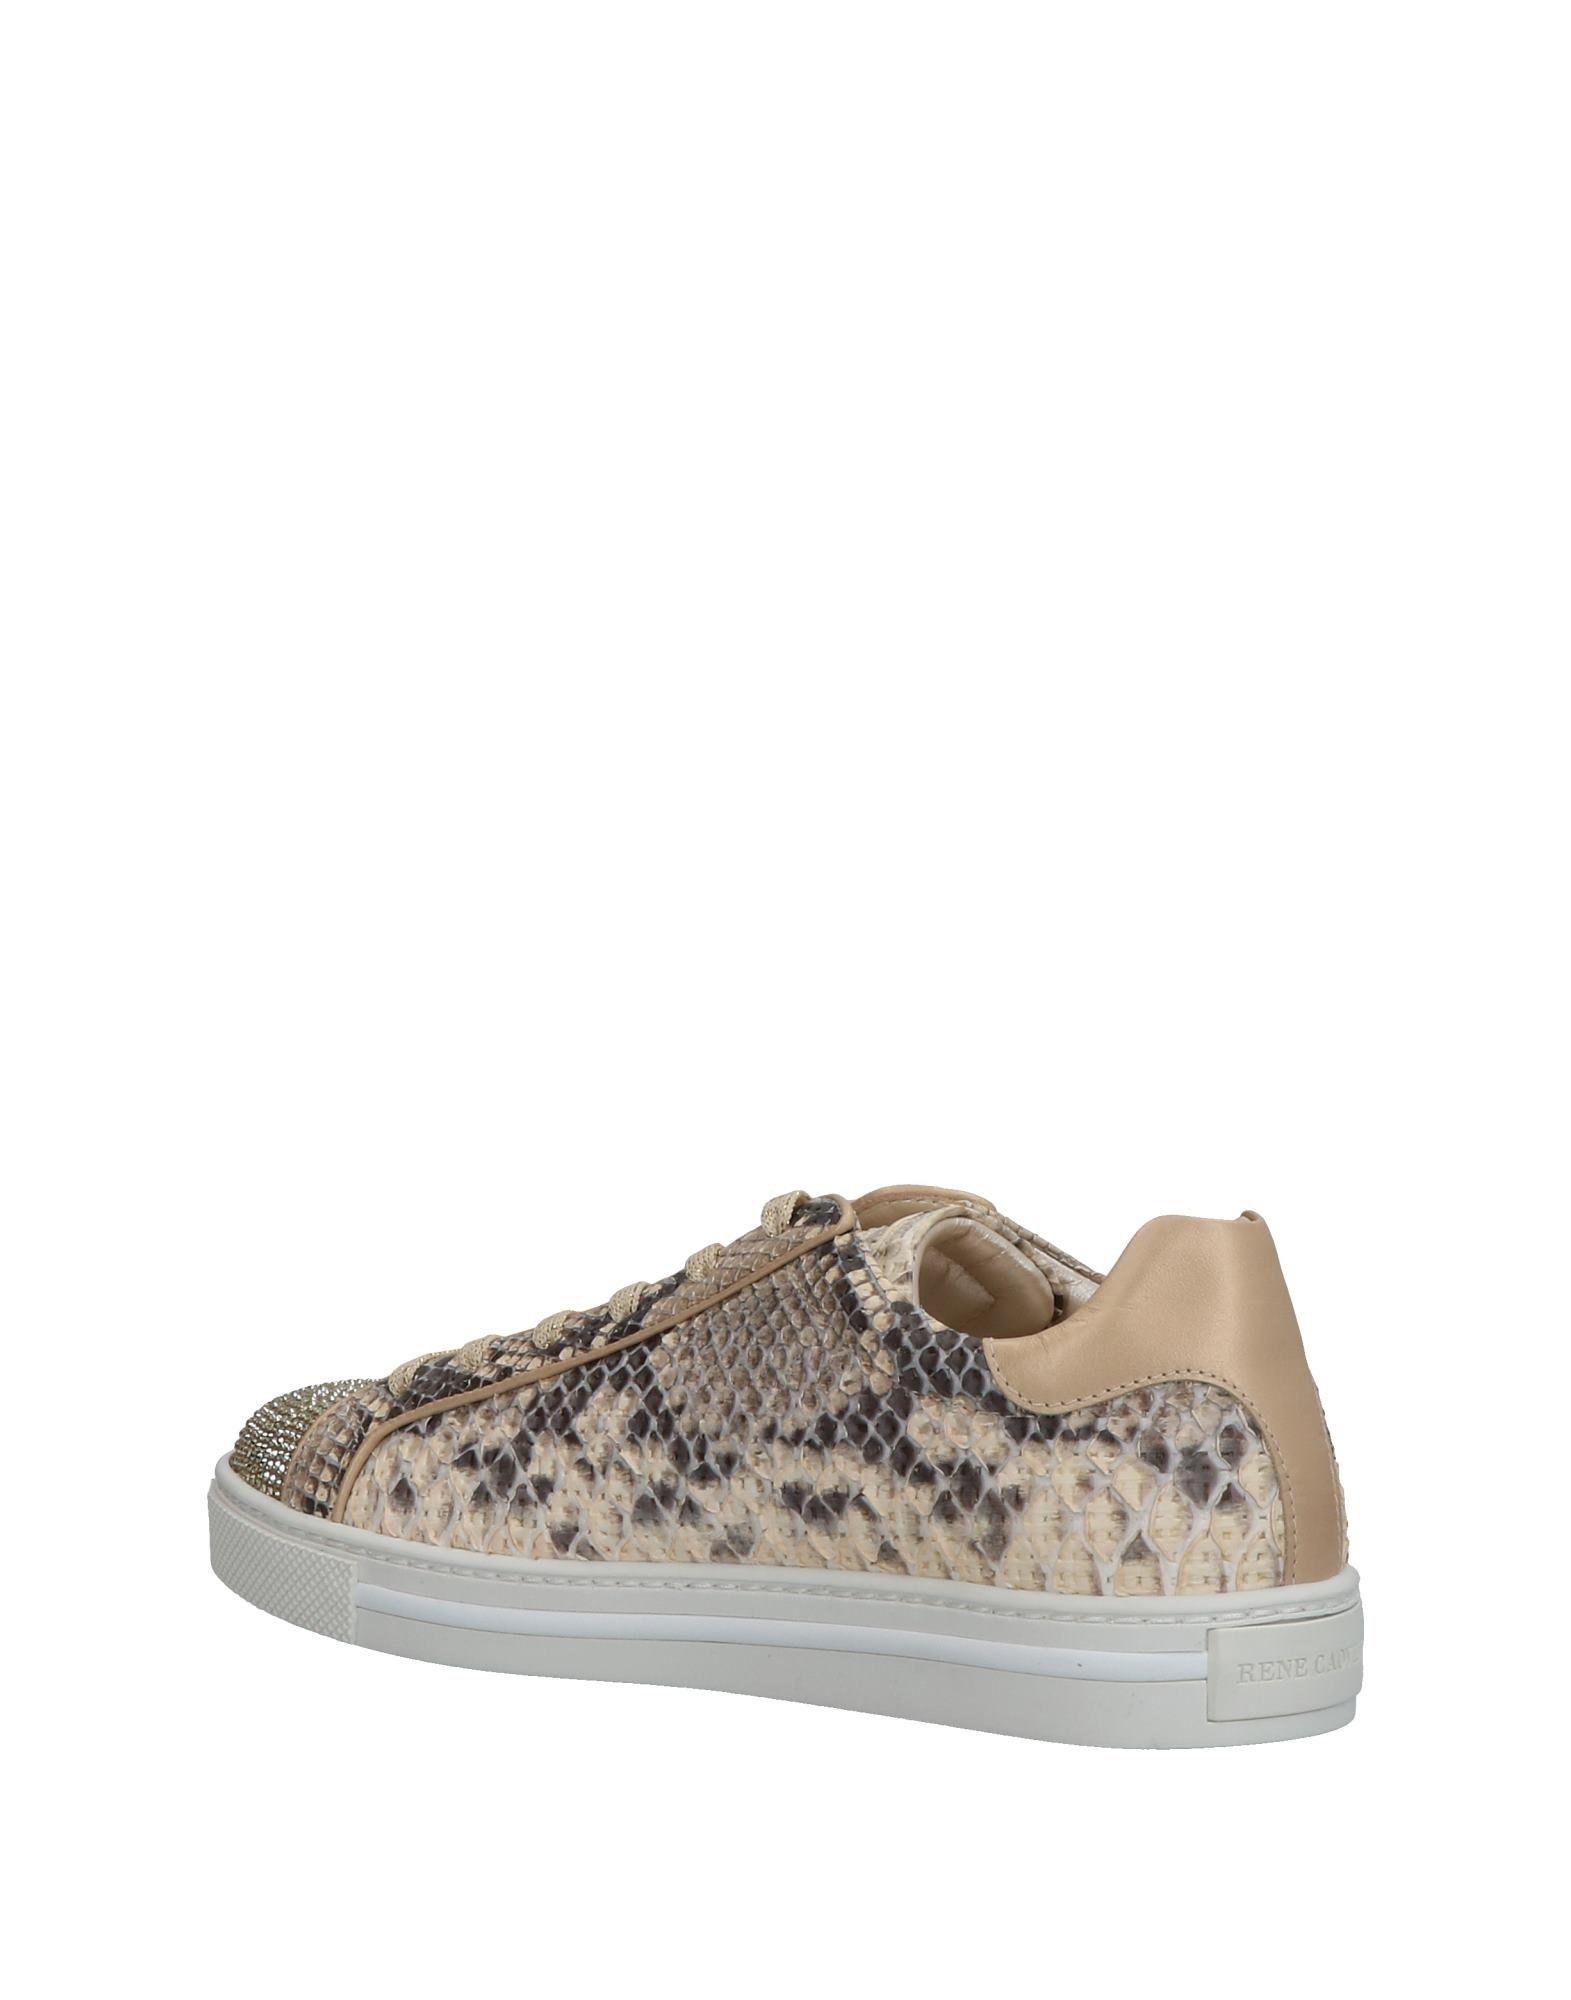 Rene' Caovilla Sneakers Damen  11354053MS Neue Schuhe